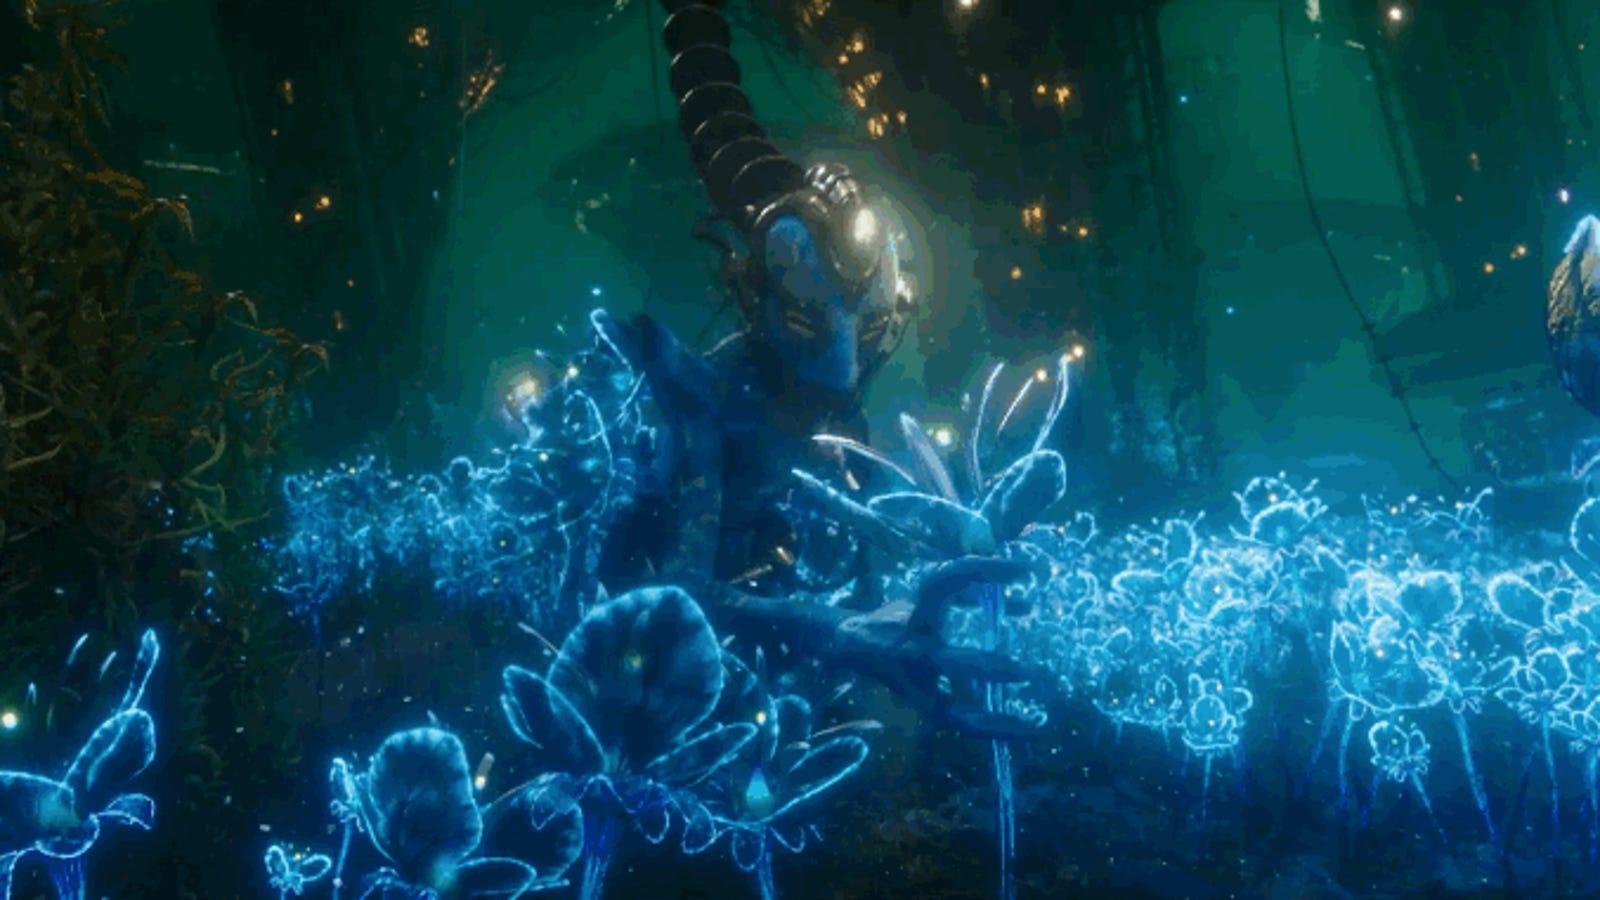 Luc Besson's Valerian Looks Like All Your Scifi Dreams Come True